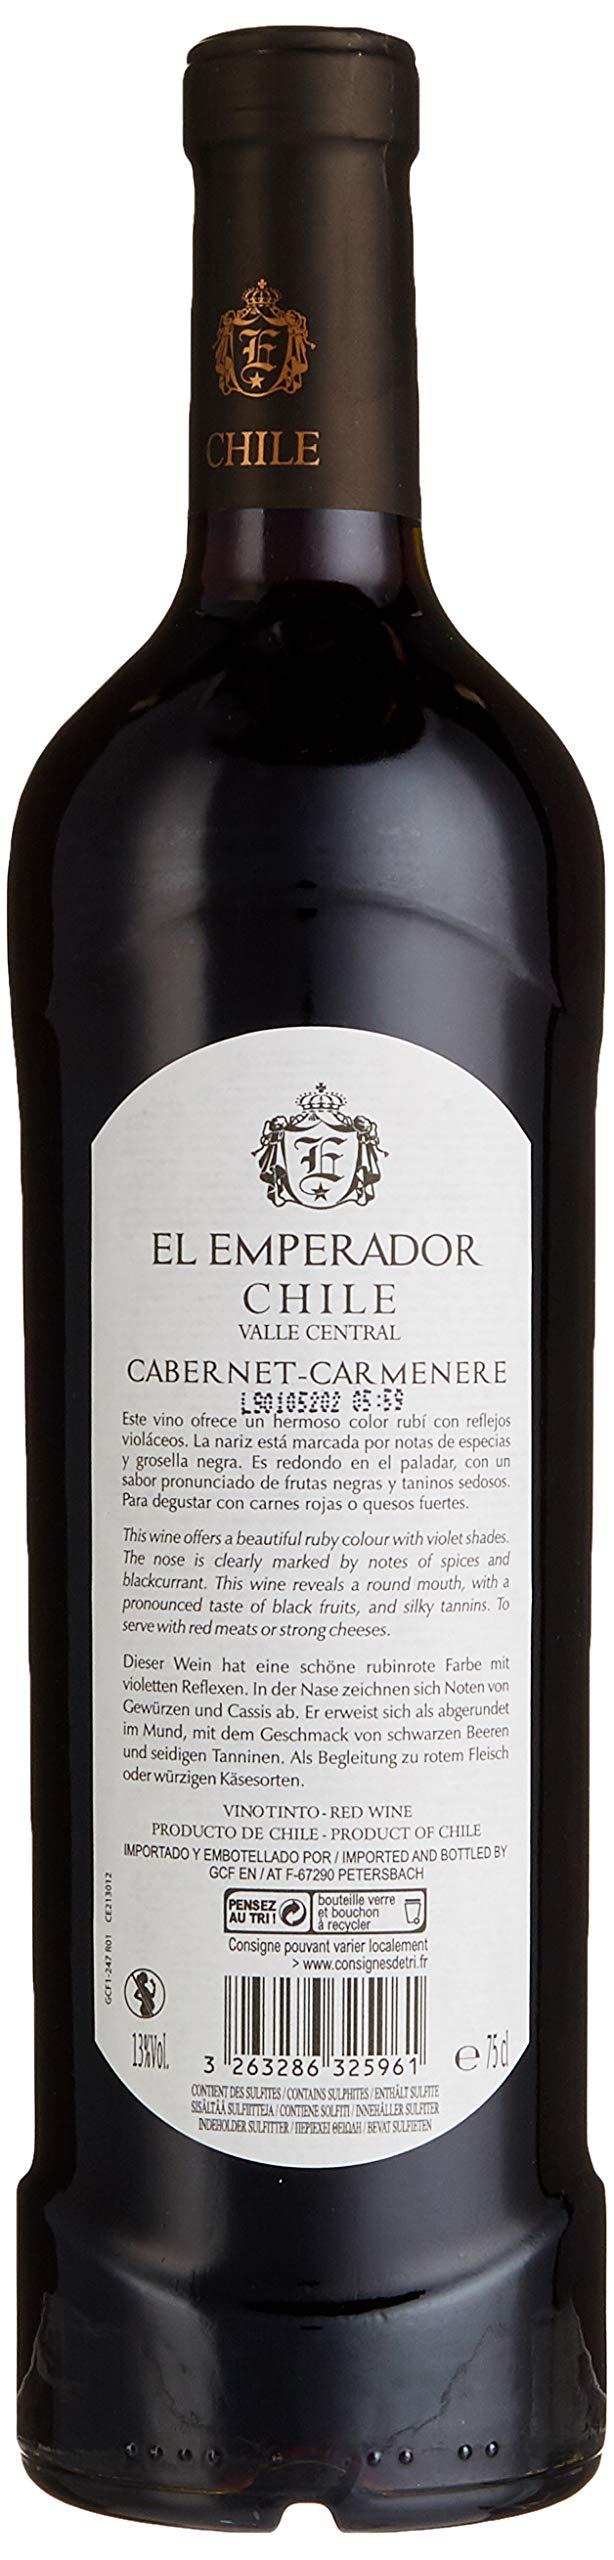 El-Emperador-Cabernet-Carmenere-Rouge-Chile-6-x-075-l